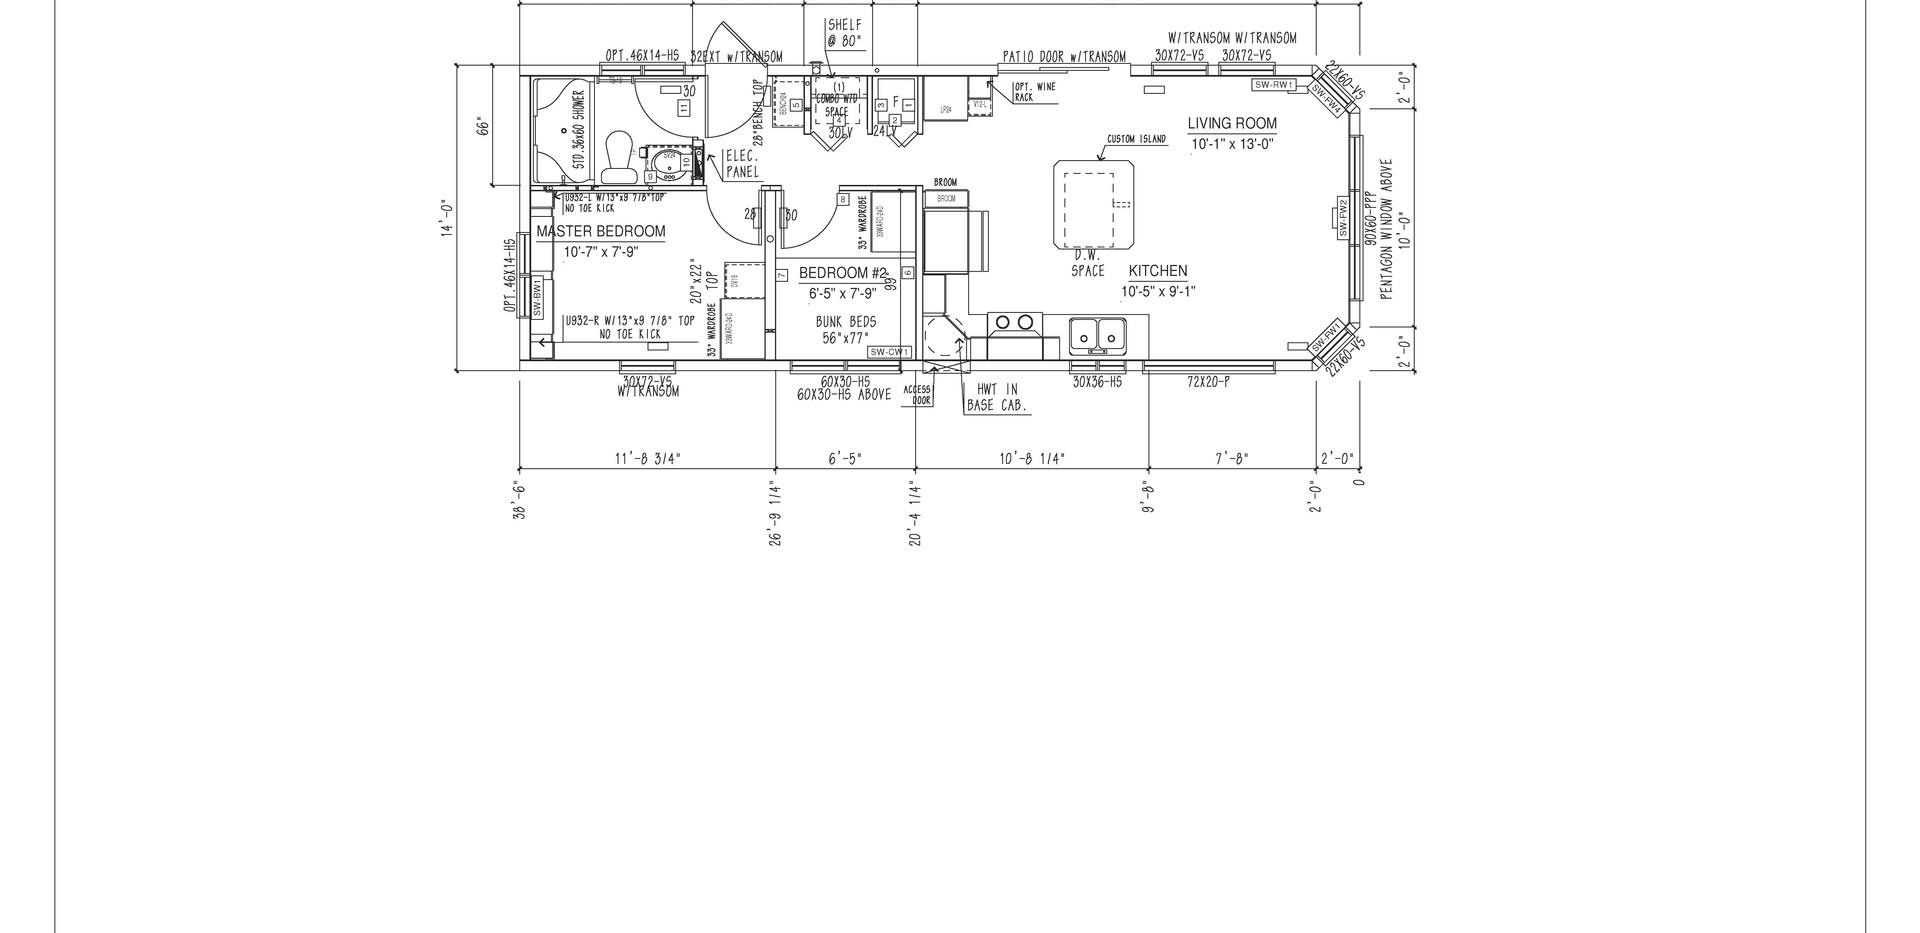 10059 Floor plan.jpg